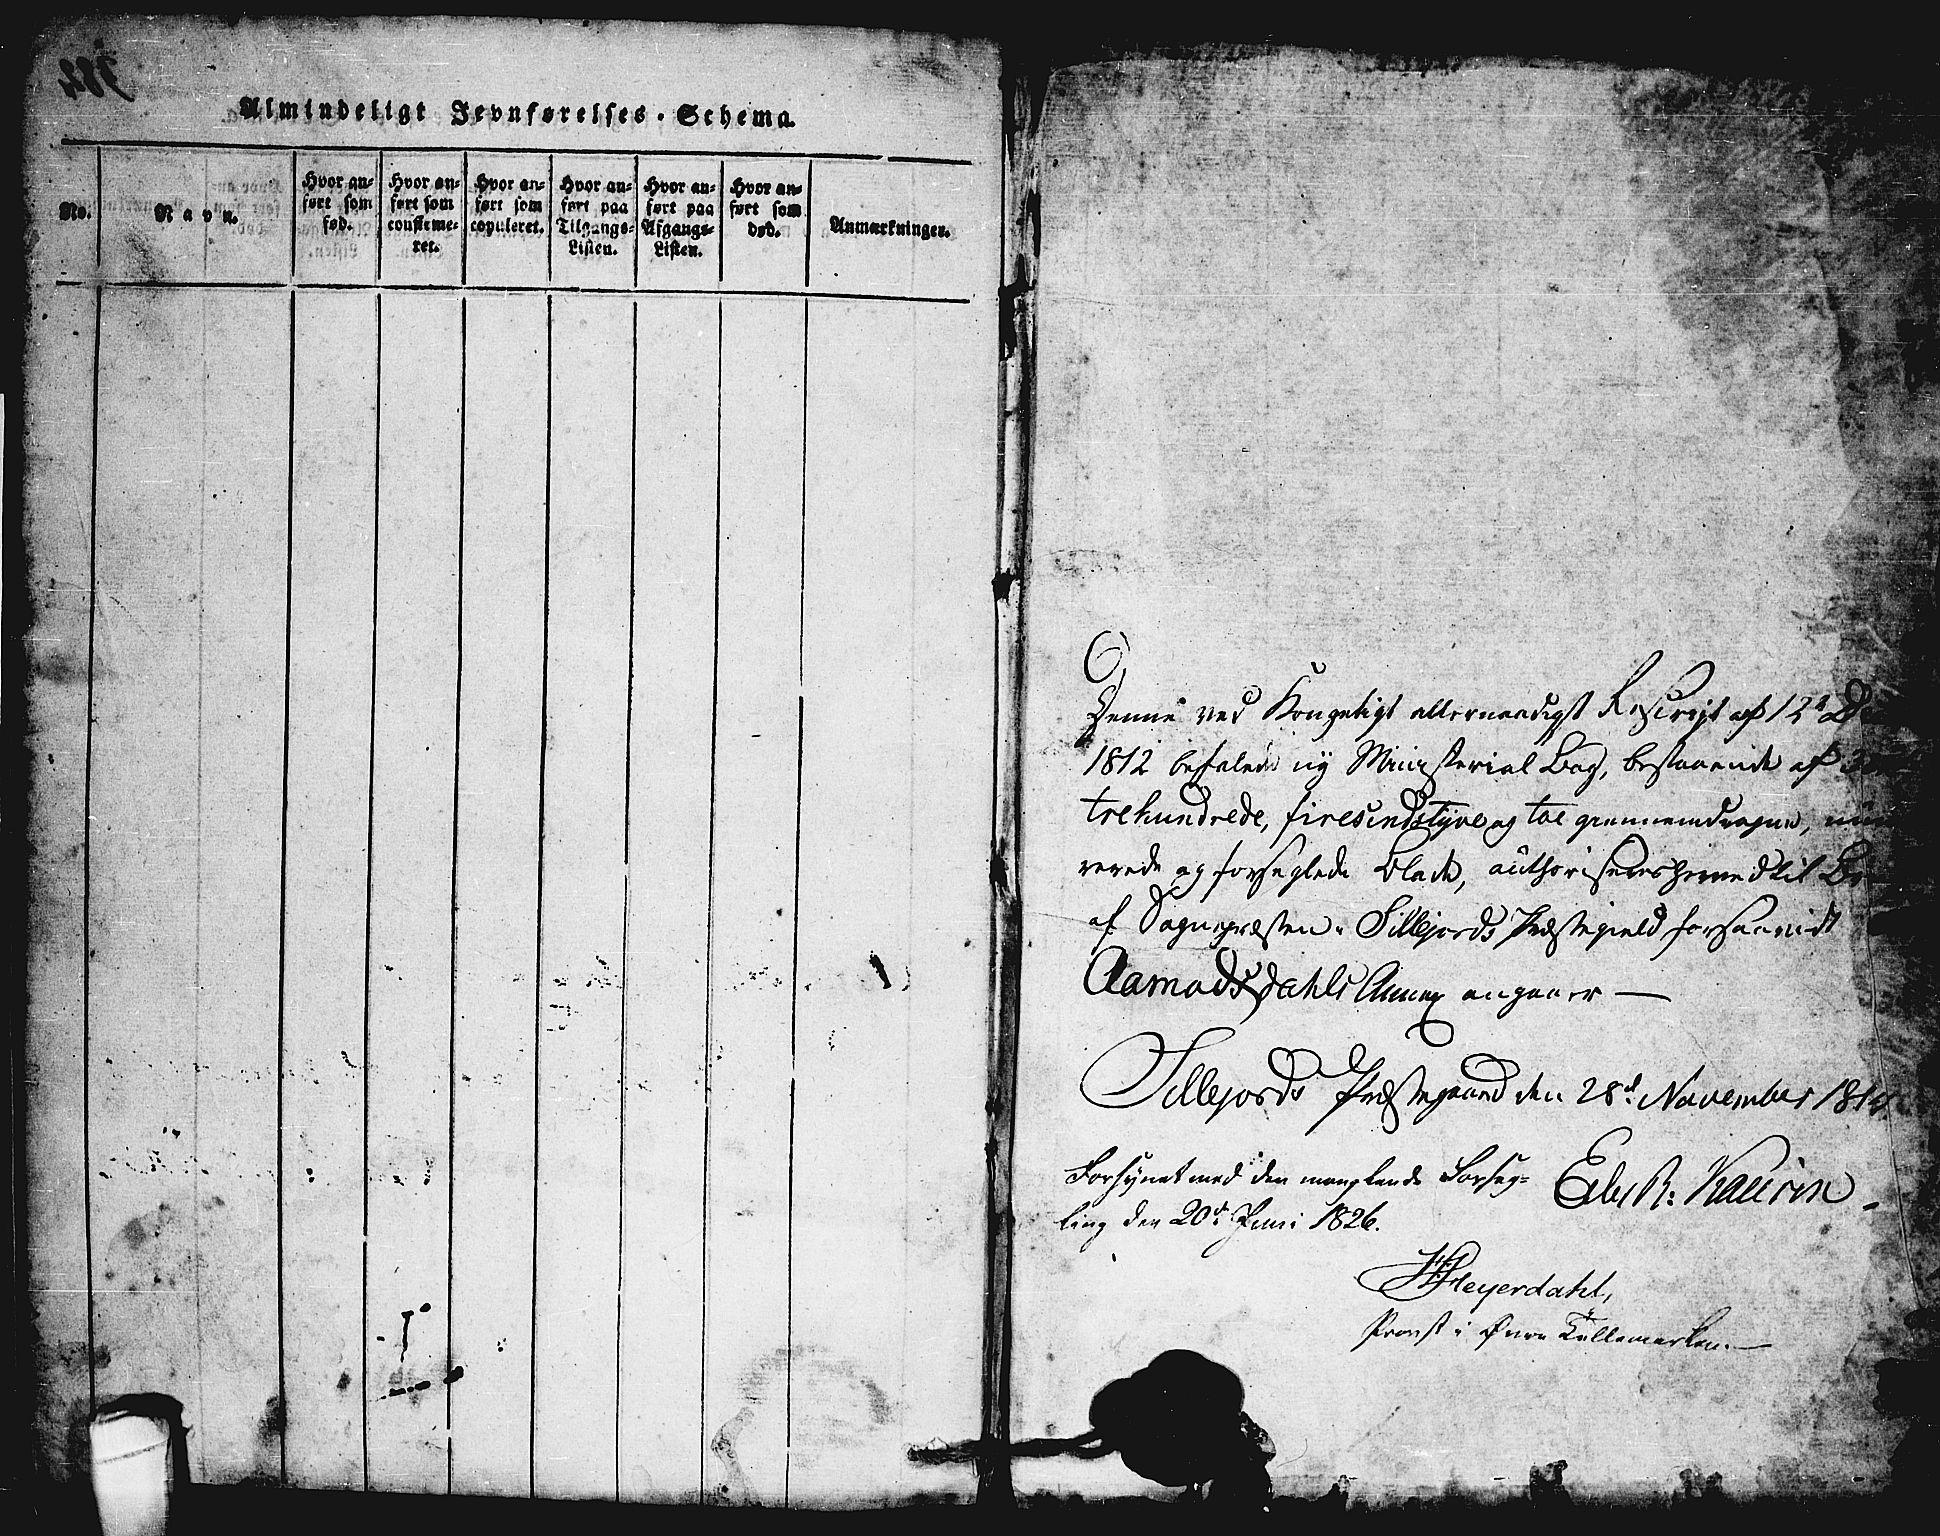 SAKO, Seljord kirkebøker, F/Fc/L0001: Ministerialbok nr. III 1, 1815-1831